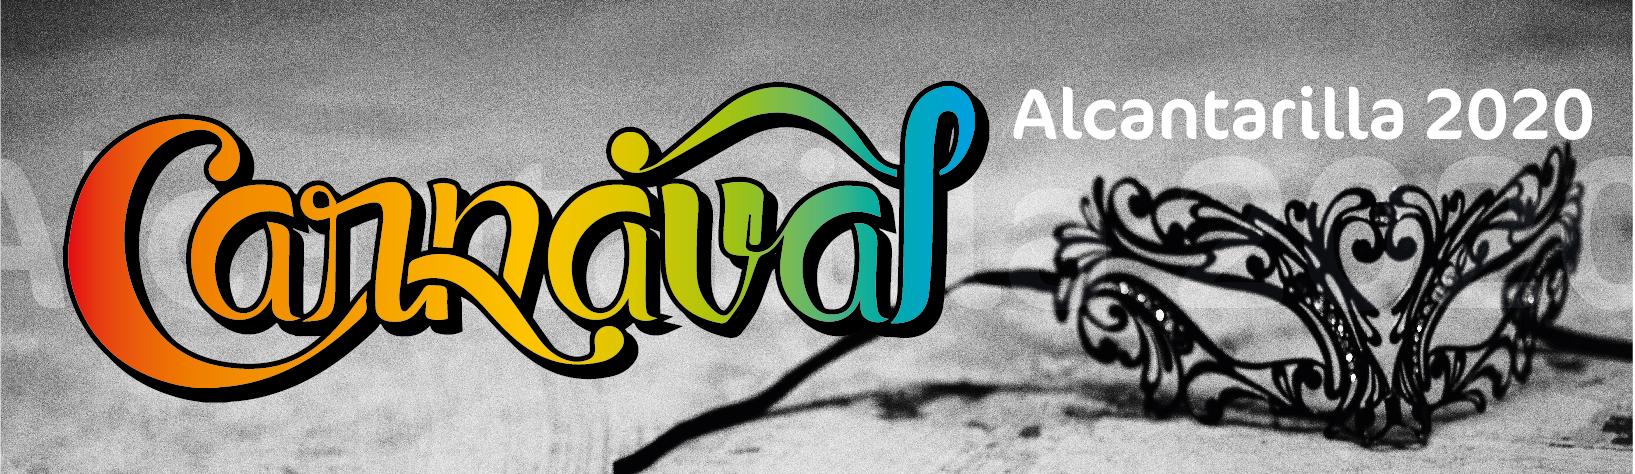 Cartel Carnaval 2020_banner